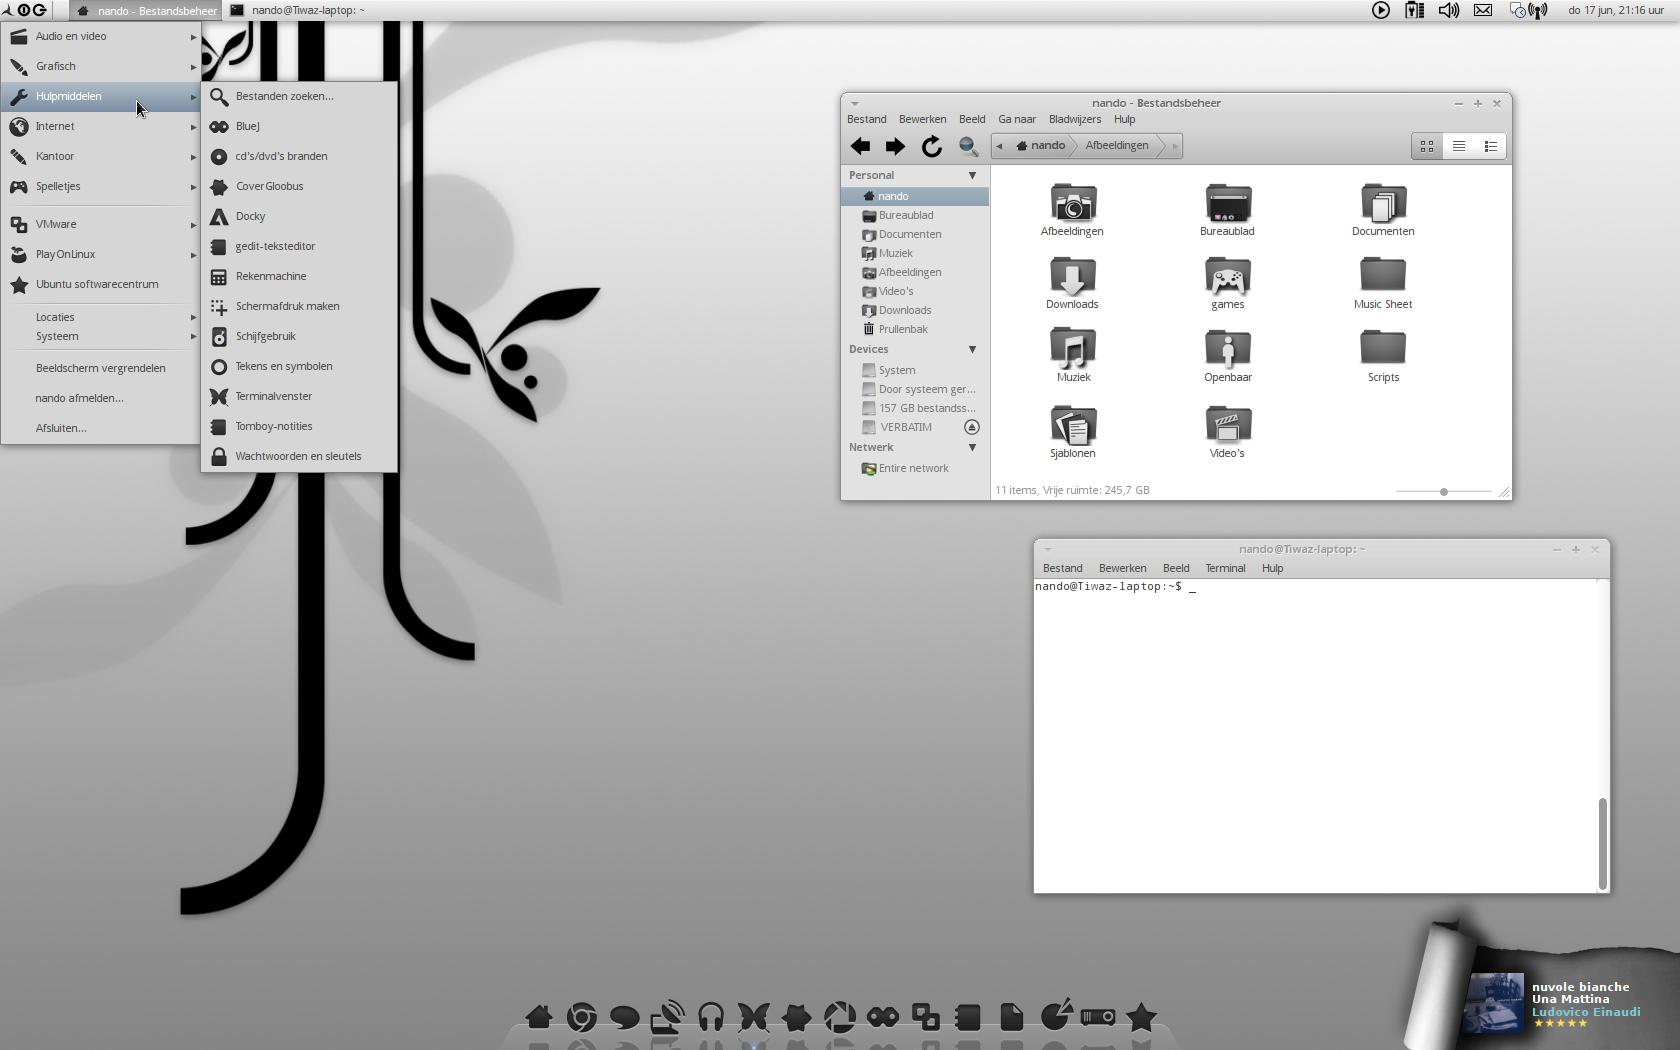 http://fc00.deviantart.net/fs71/f/2010/168/5/5/Ubuntu_10_04_My_newest_desktop_by_cookiebisquit.png